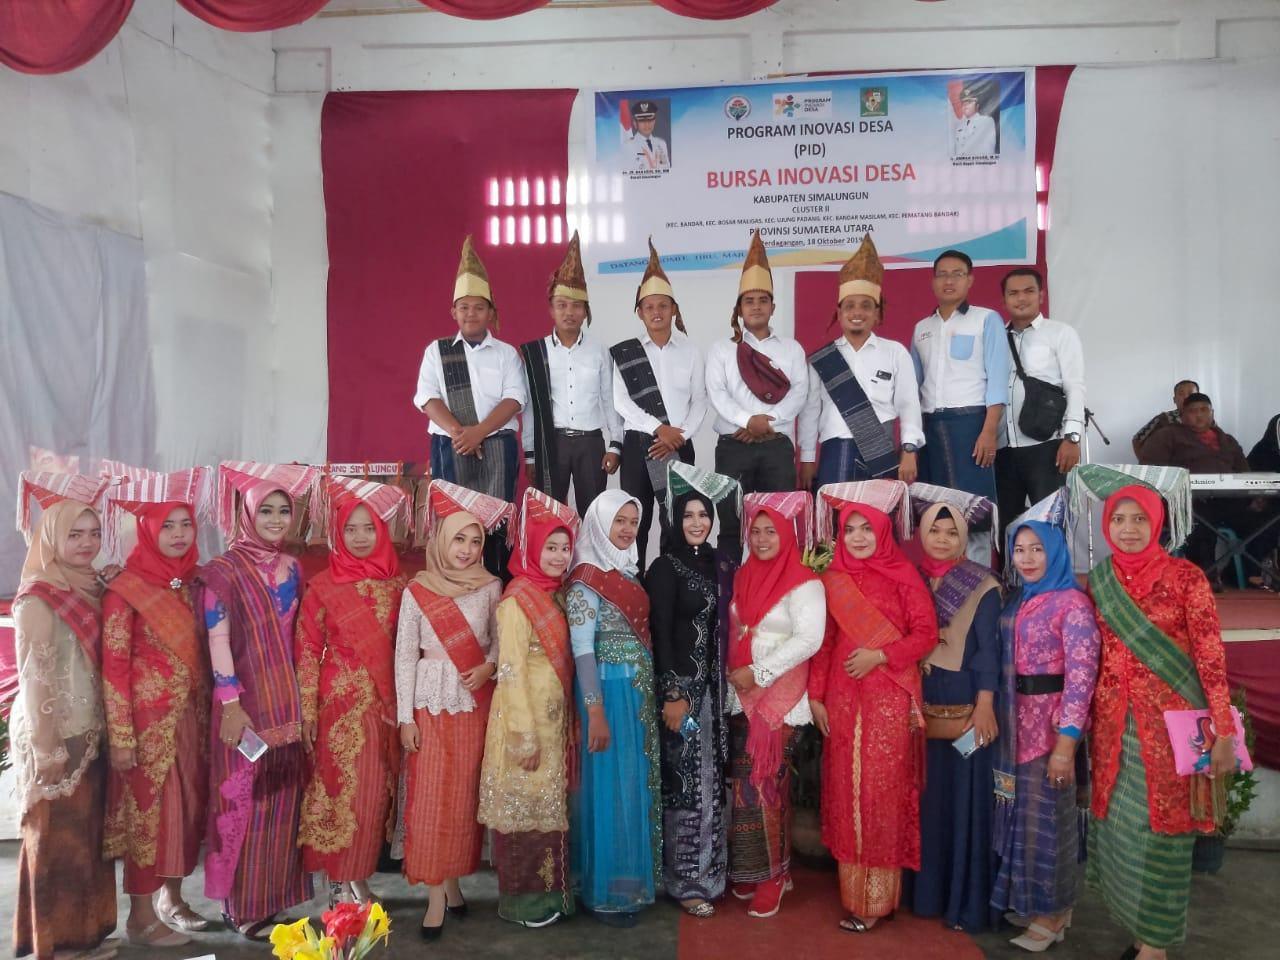 Bursa Inovasi Desa 2019, Tingkatkan Pembangunan dan Pemberdayaan Masyarakat